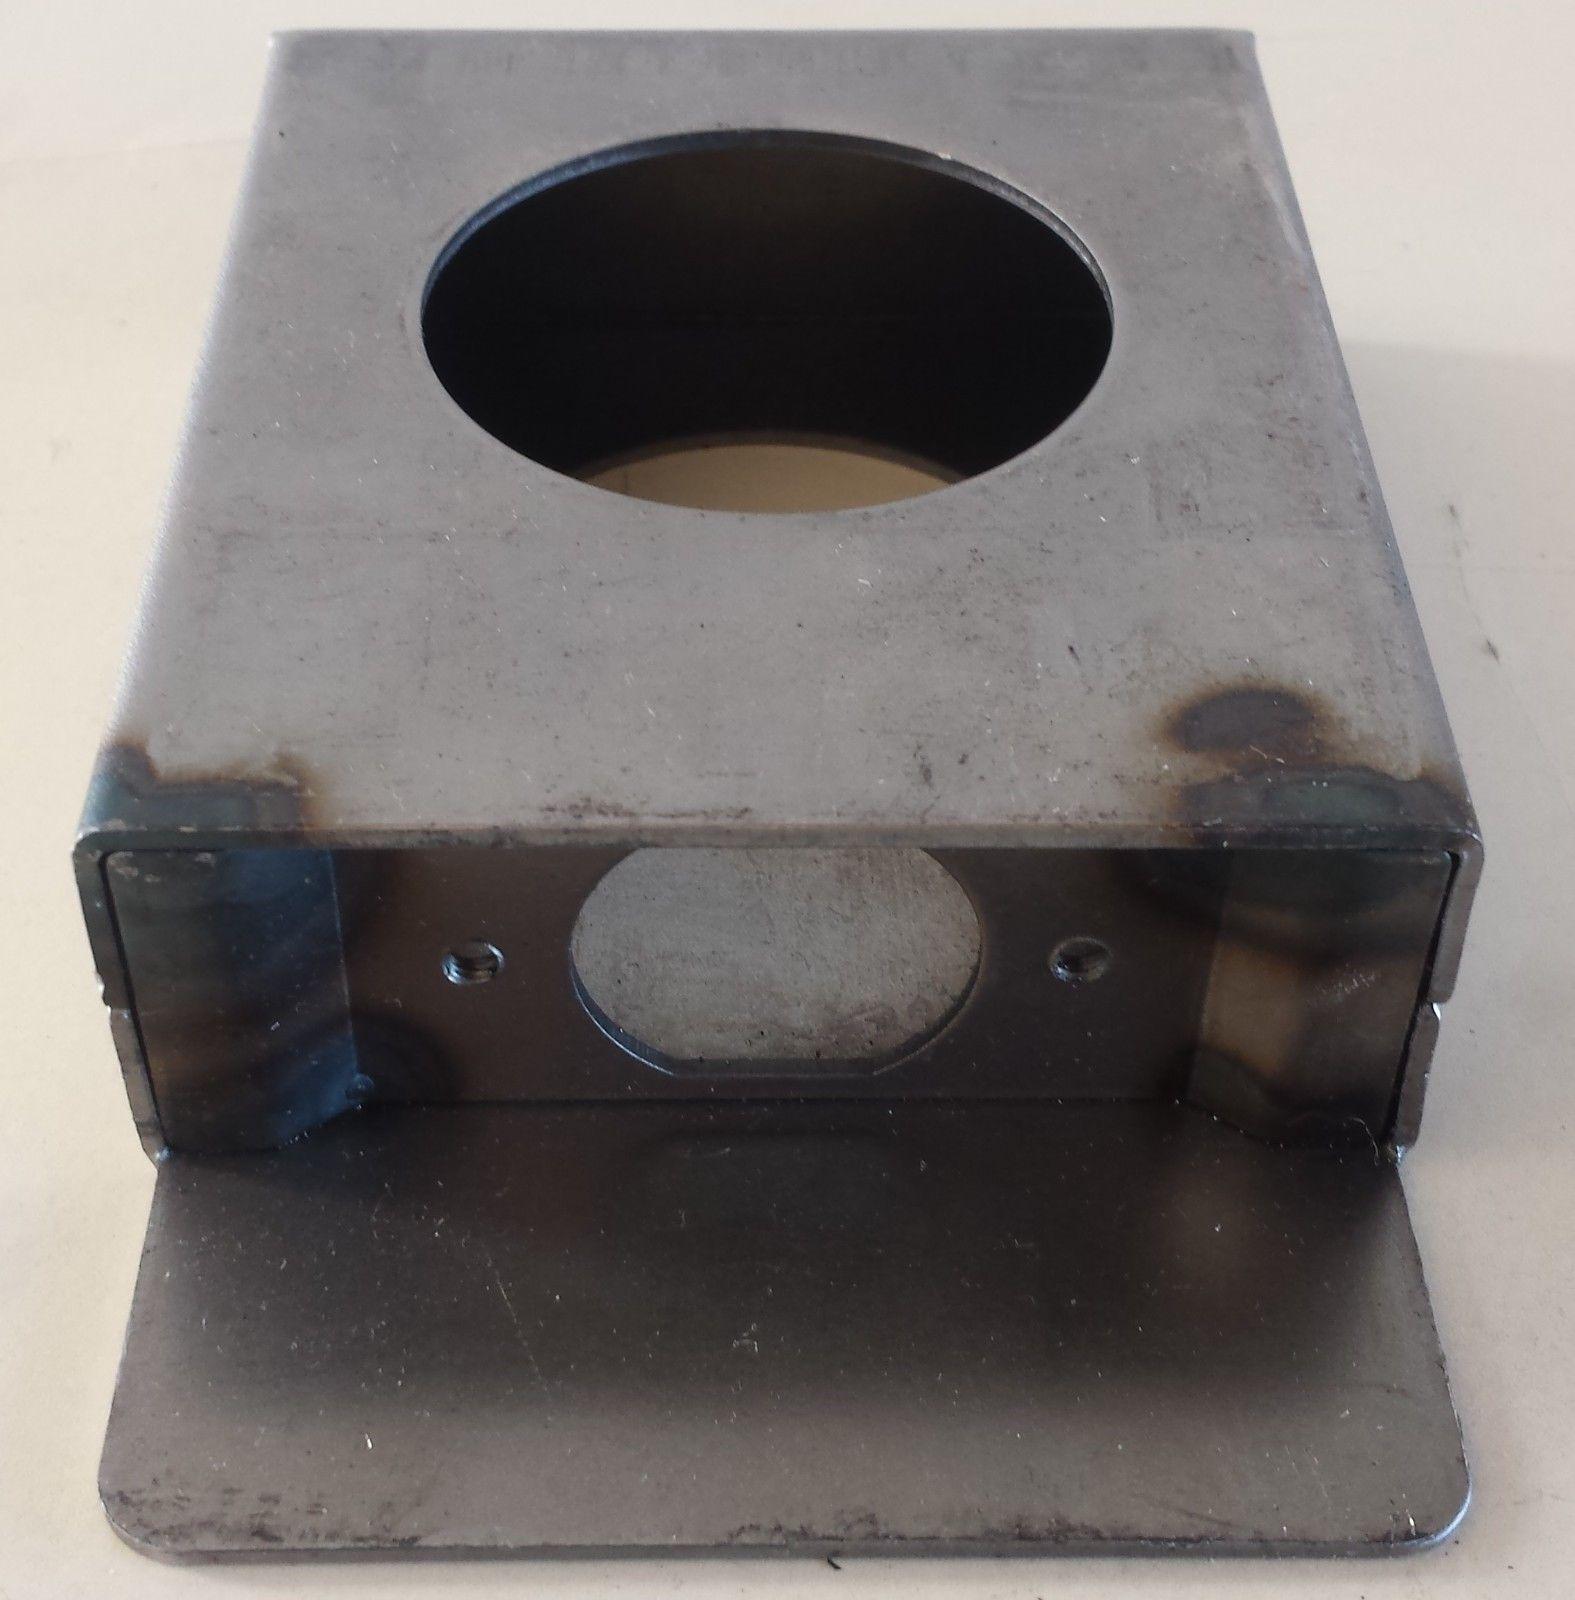 2x Gate Door Steel Lock Box Single Hole Weld 1 1 4 X 3 1